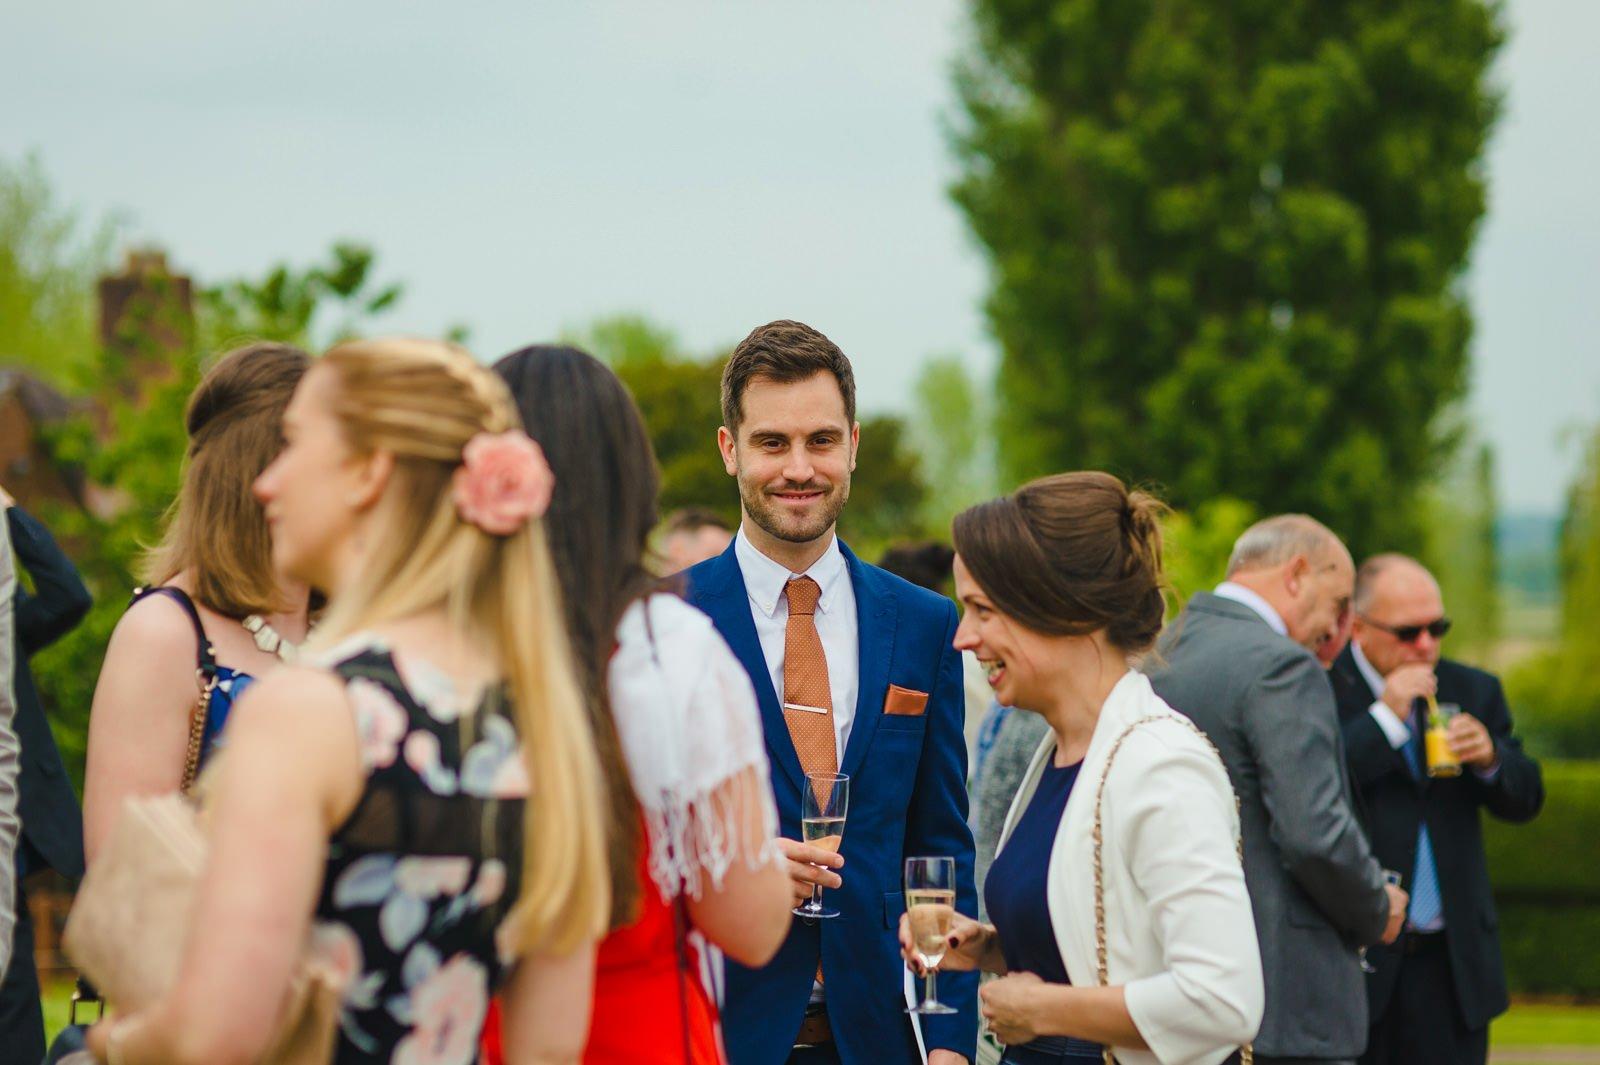 Millers Of Netley wedding, Dorrington, Shrewsbury | Emma + Ben 54